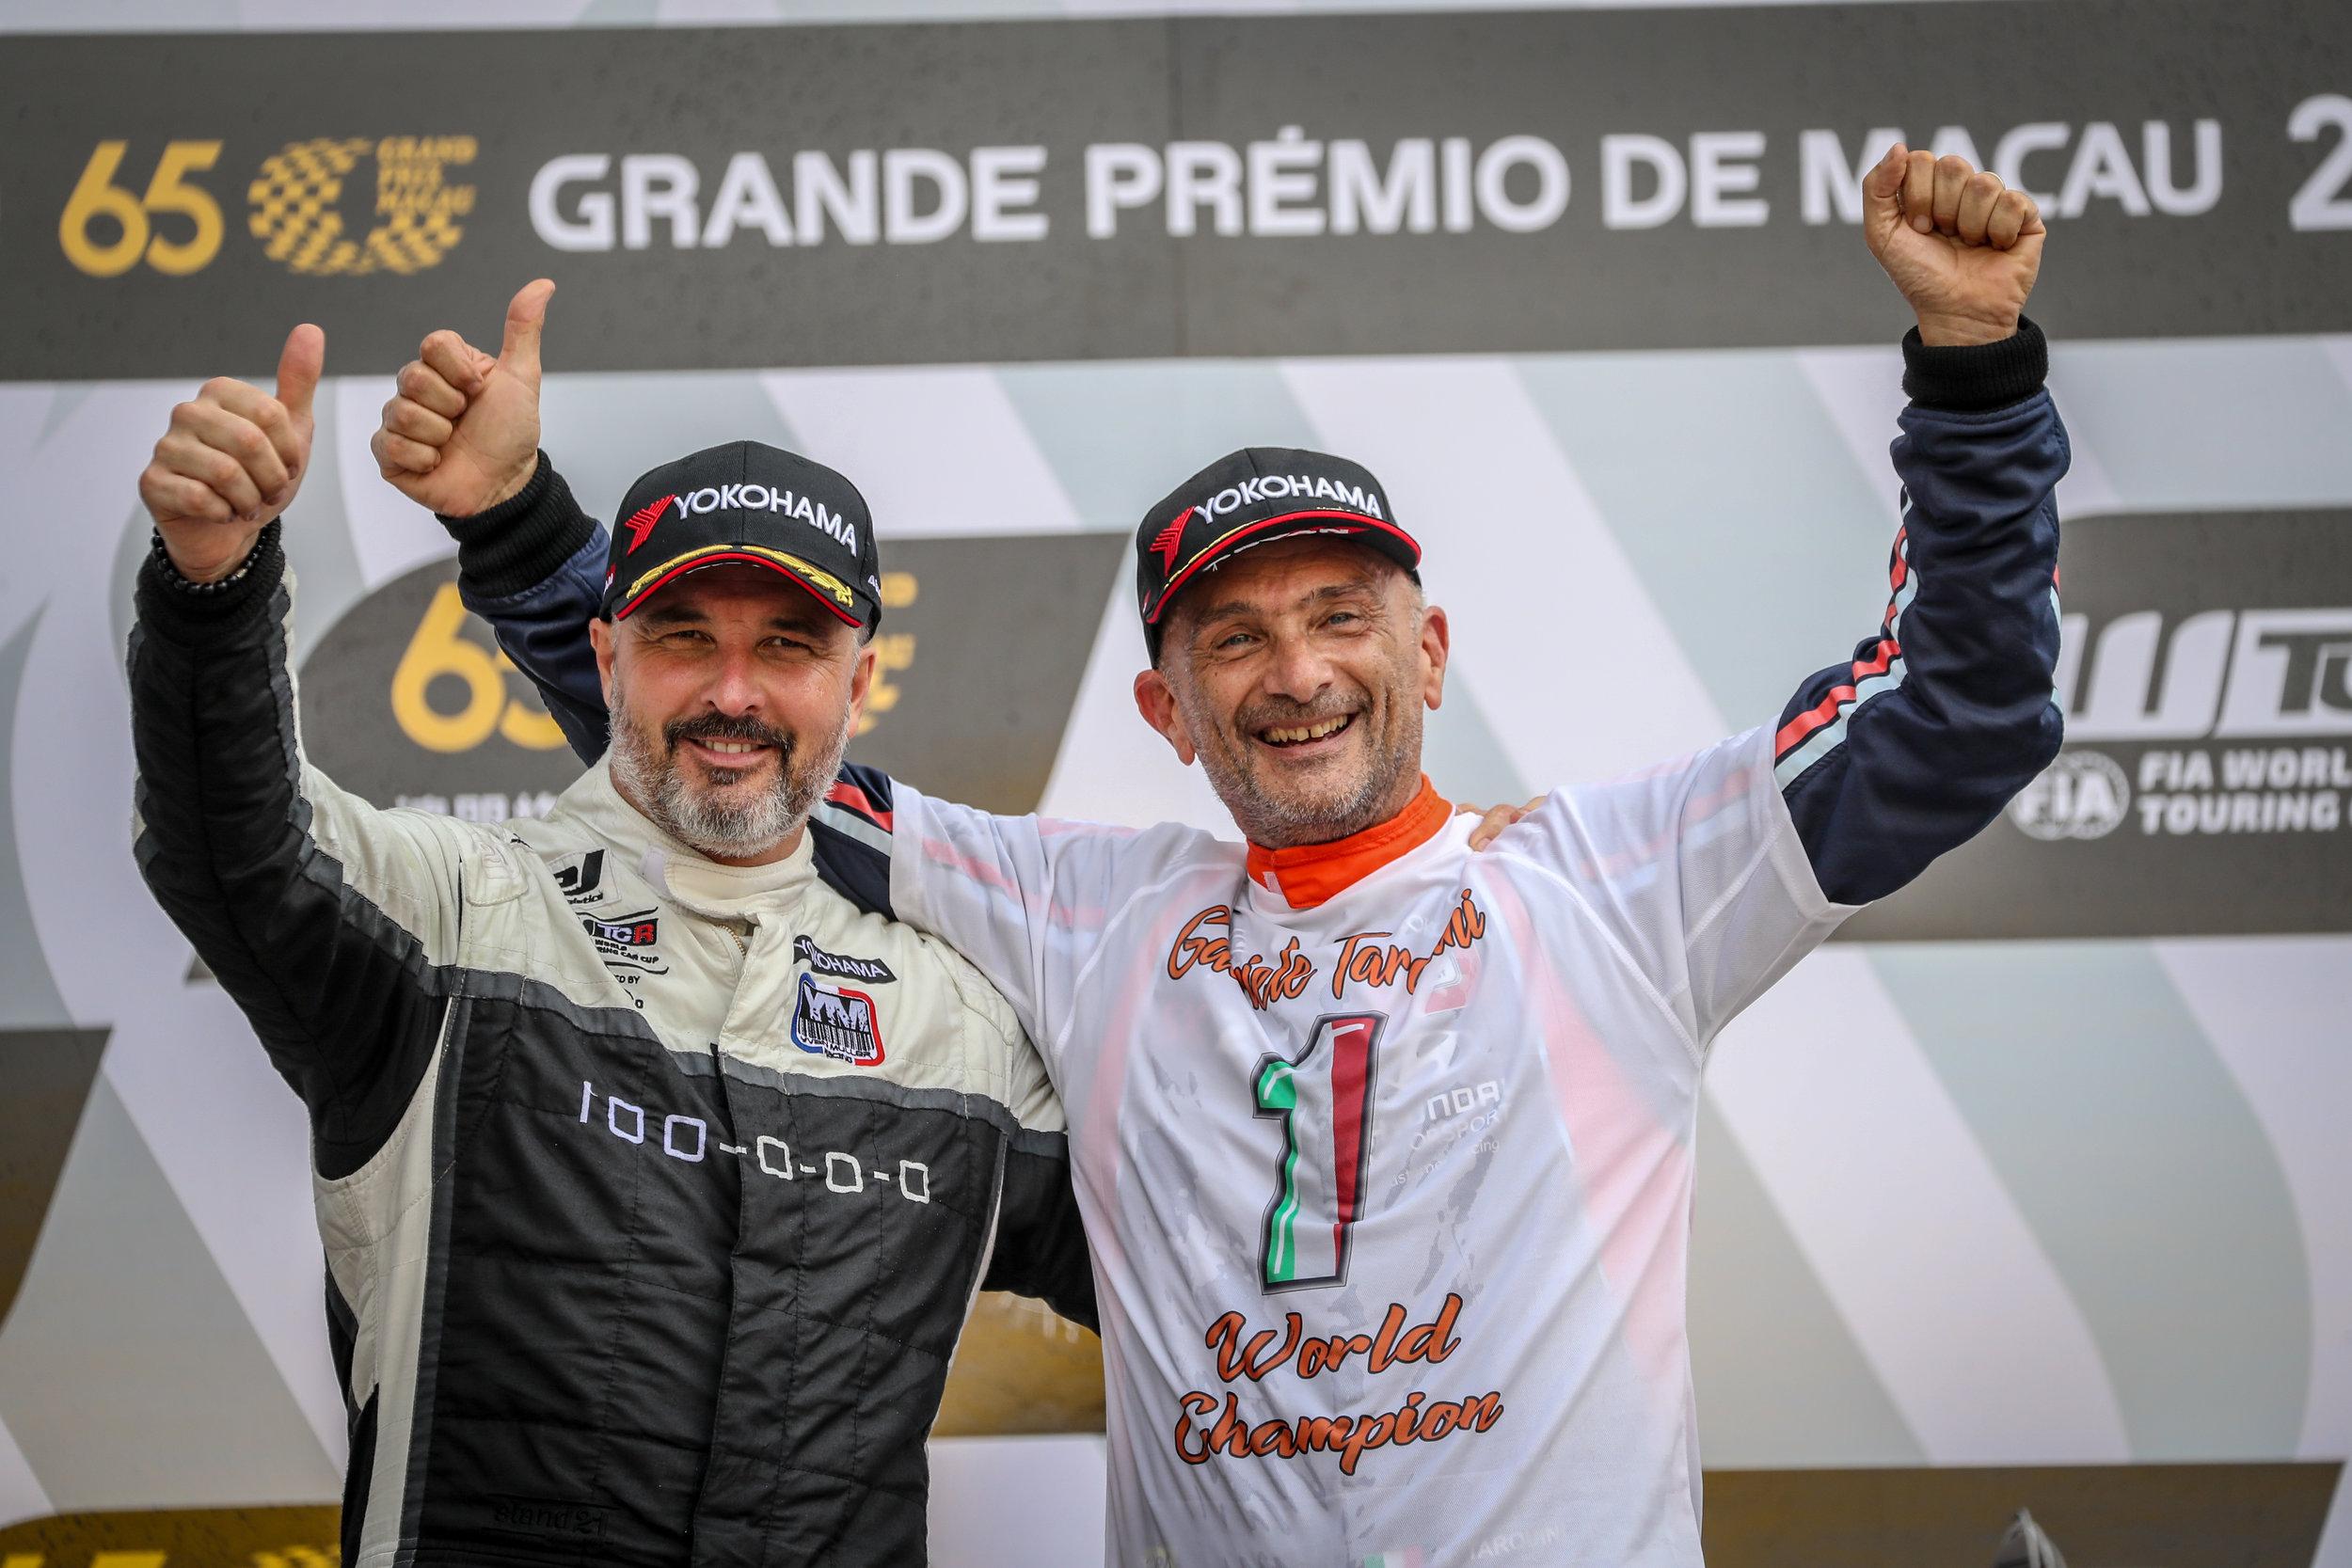 WTCR Yvan Muller Tranquini Gabriele YOKOHAMA Motorsports Macau